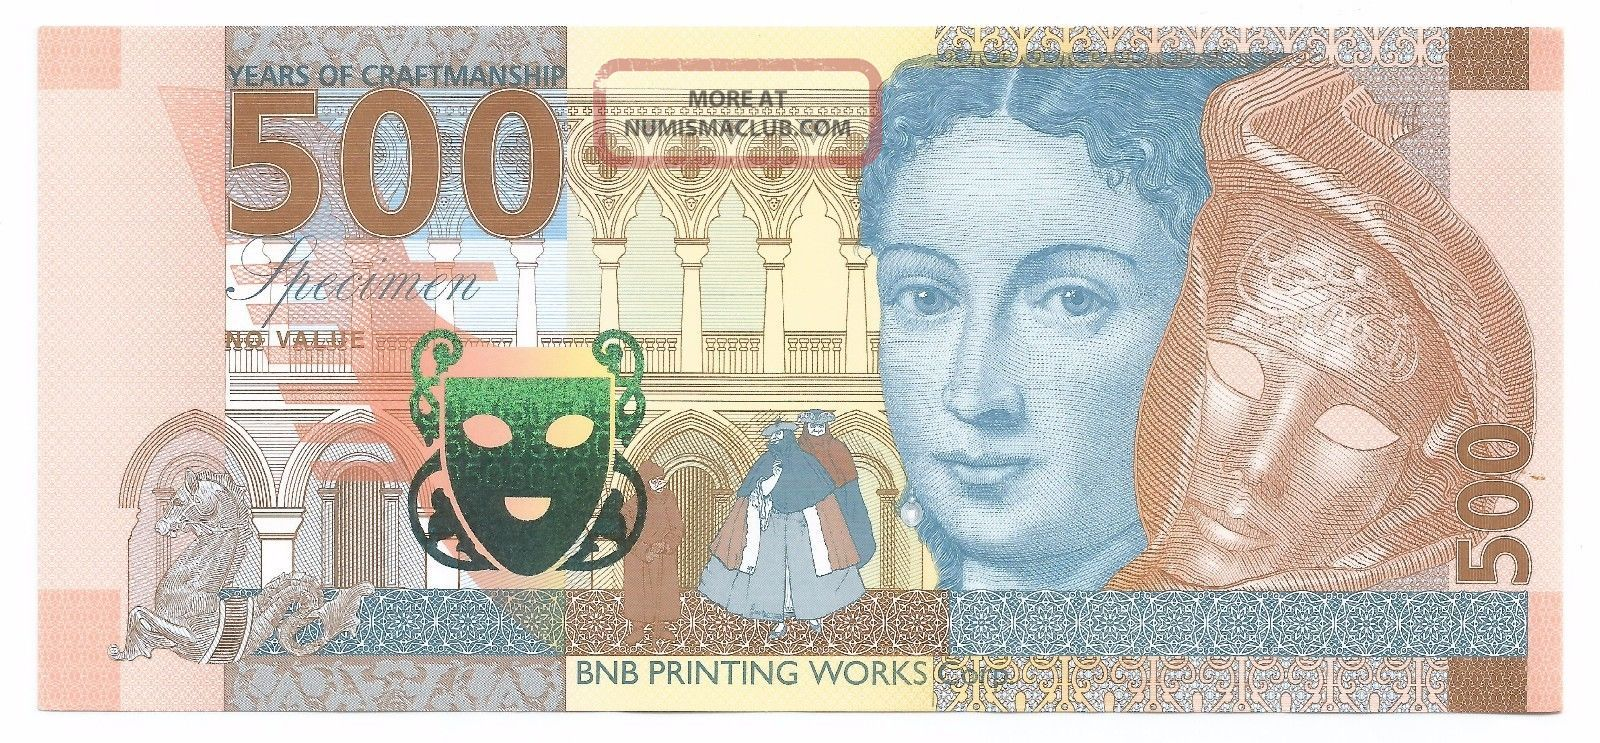 Banknote: Specimen Bulgaria - Bnb Printing 500 Years Of Craftmanship - Unc Europe photo